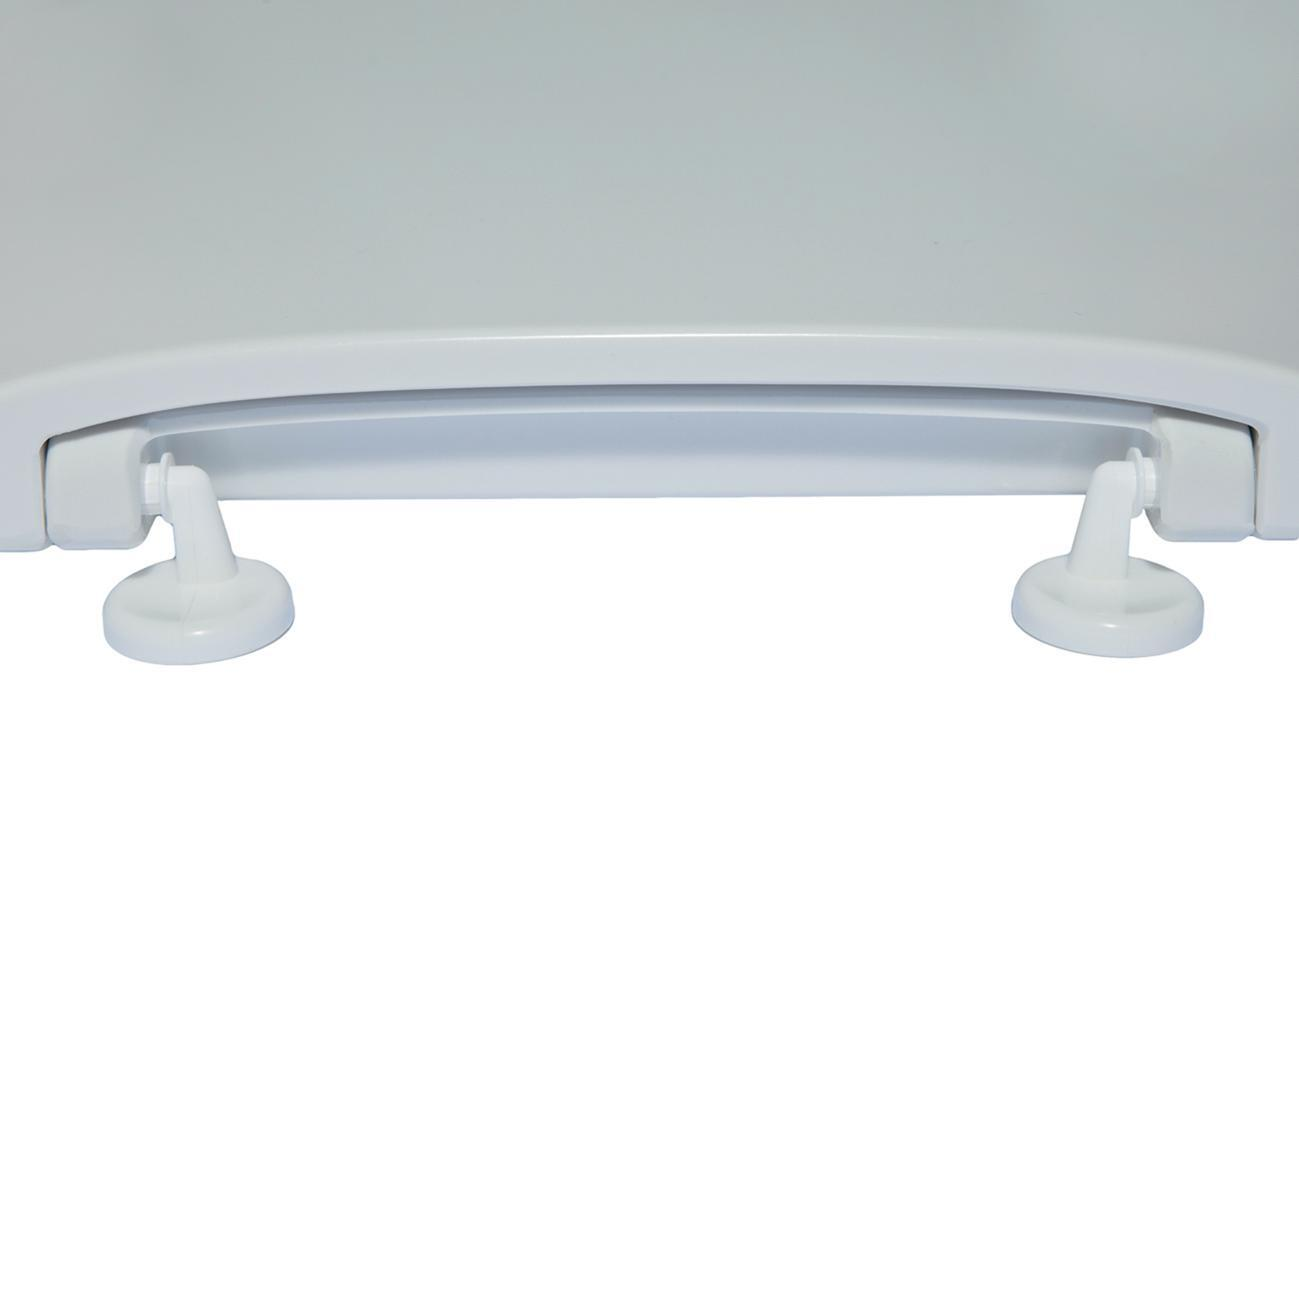 Copriwater ovale Originale per serie sanitari Miky New IDEAL STANDARD termoindurente bianco - 7